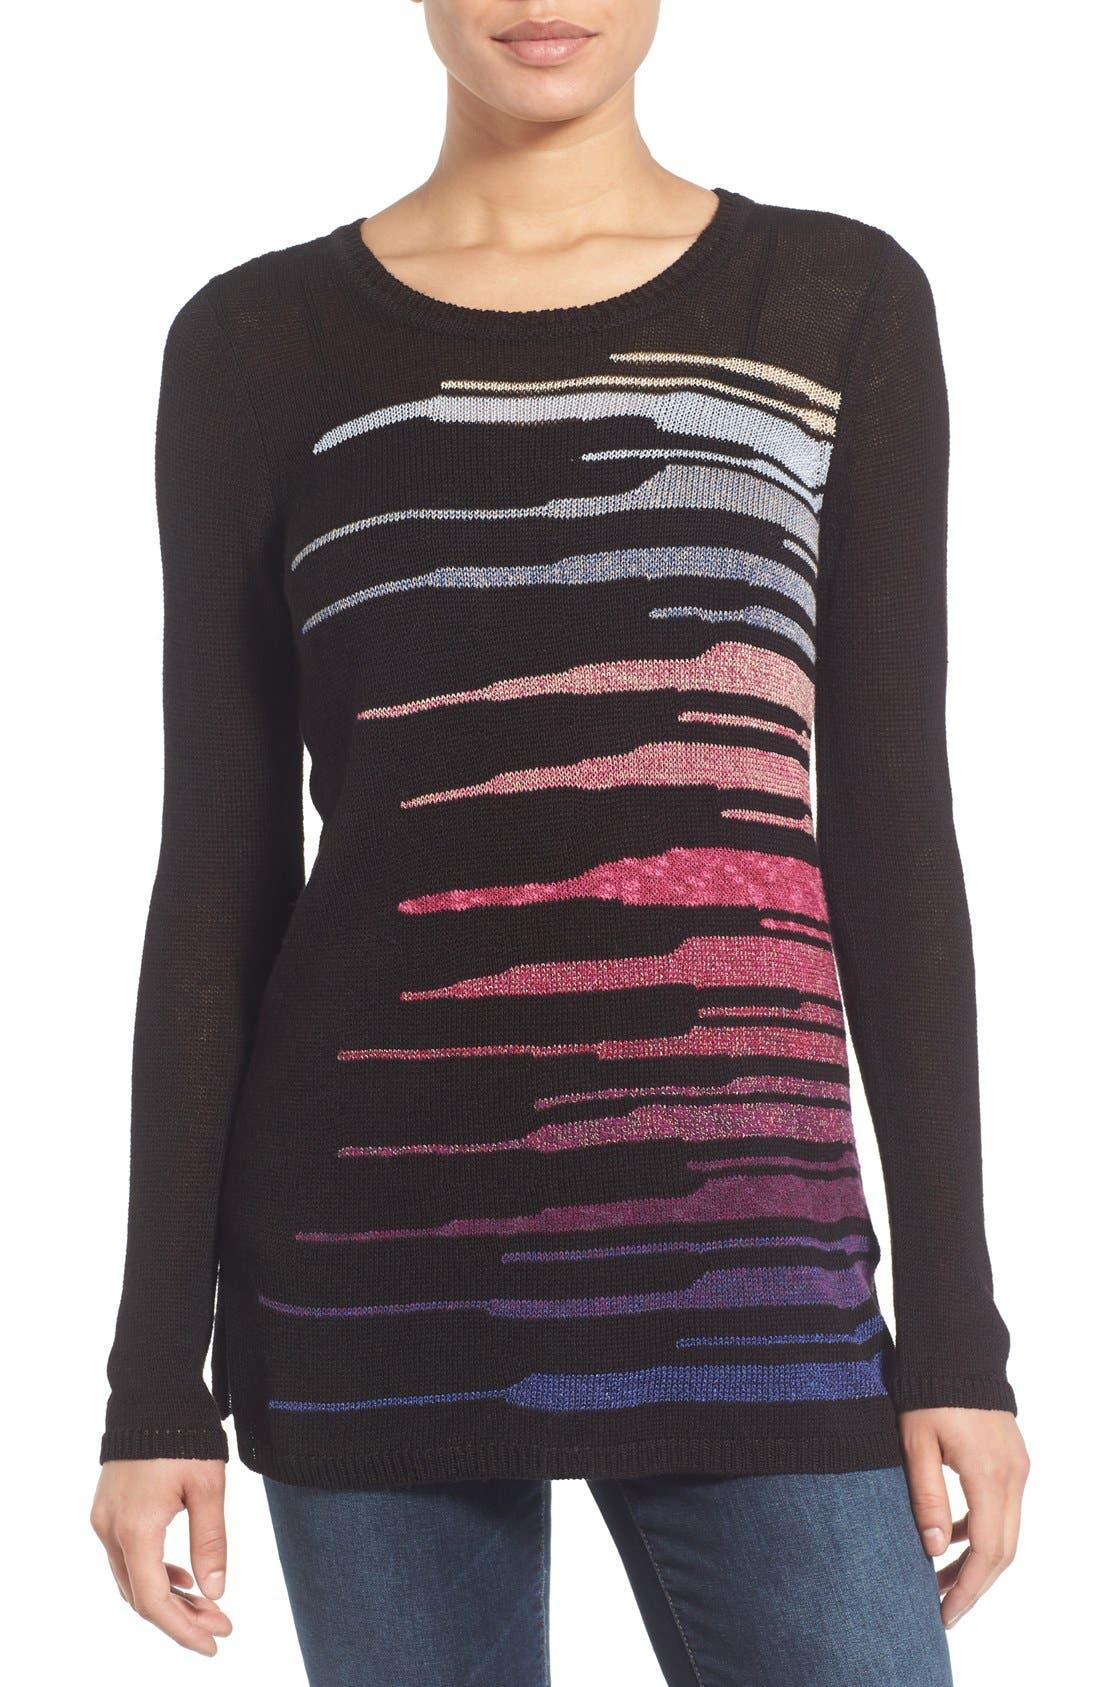 Main Image - NIC+ZOE 'Speared' Print Lightweight Sweater